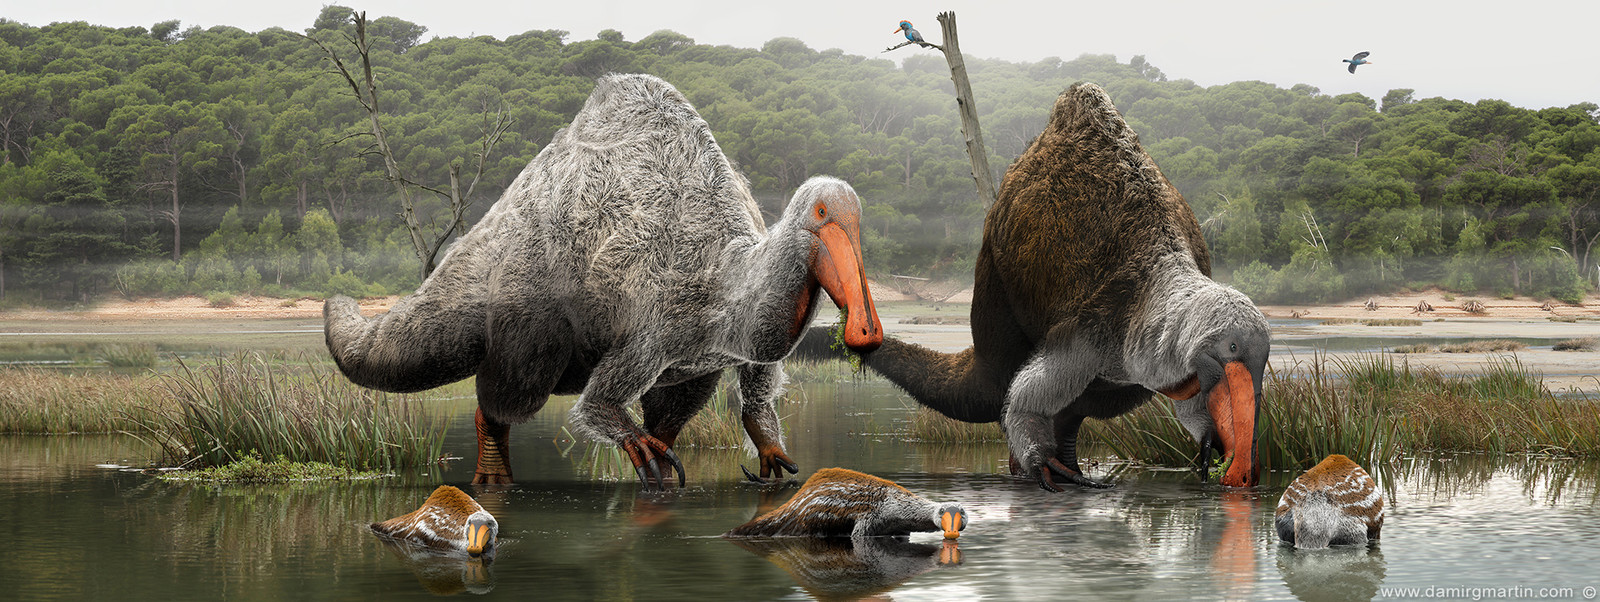 Deinocheirus family portrait